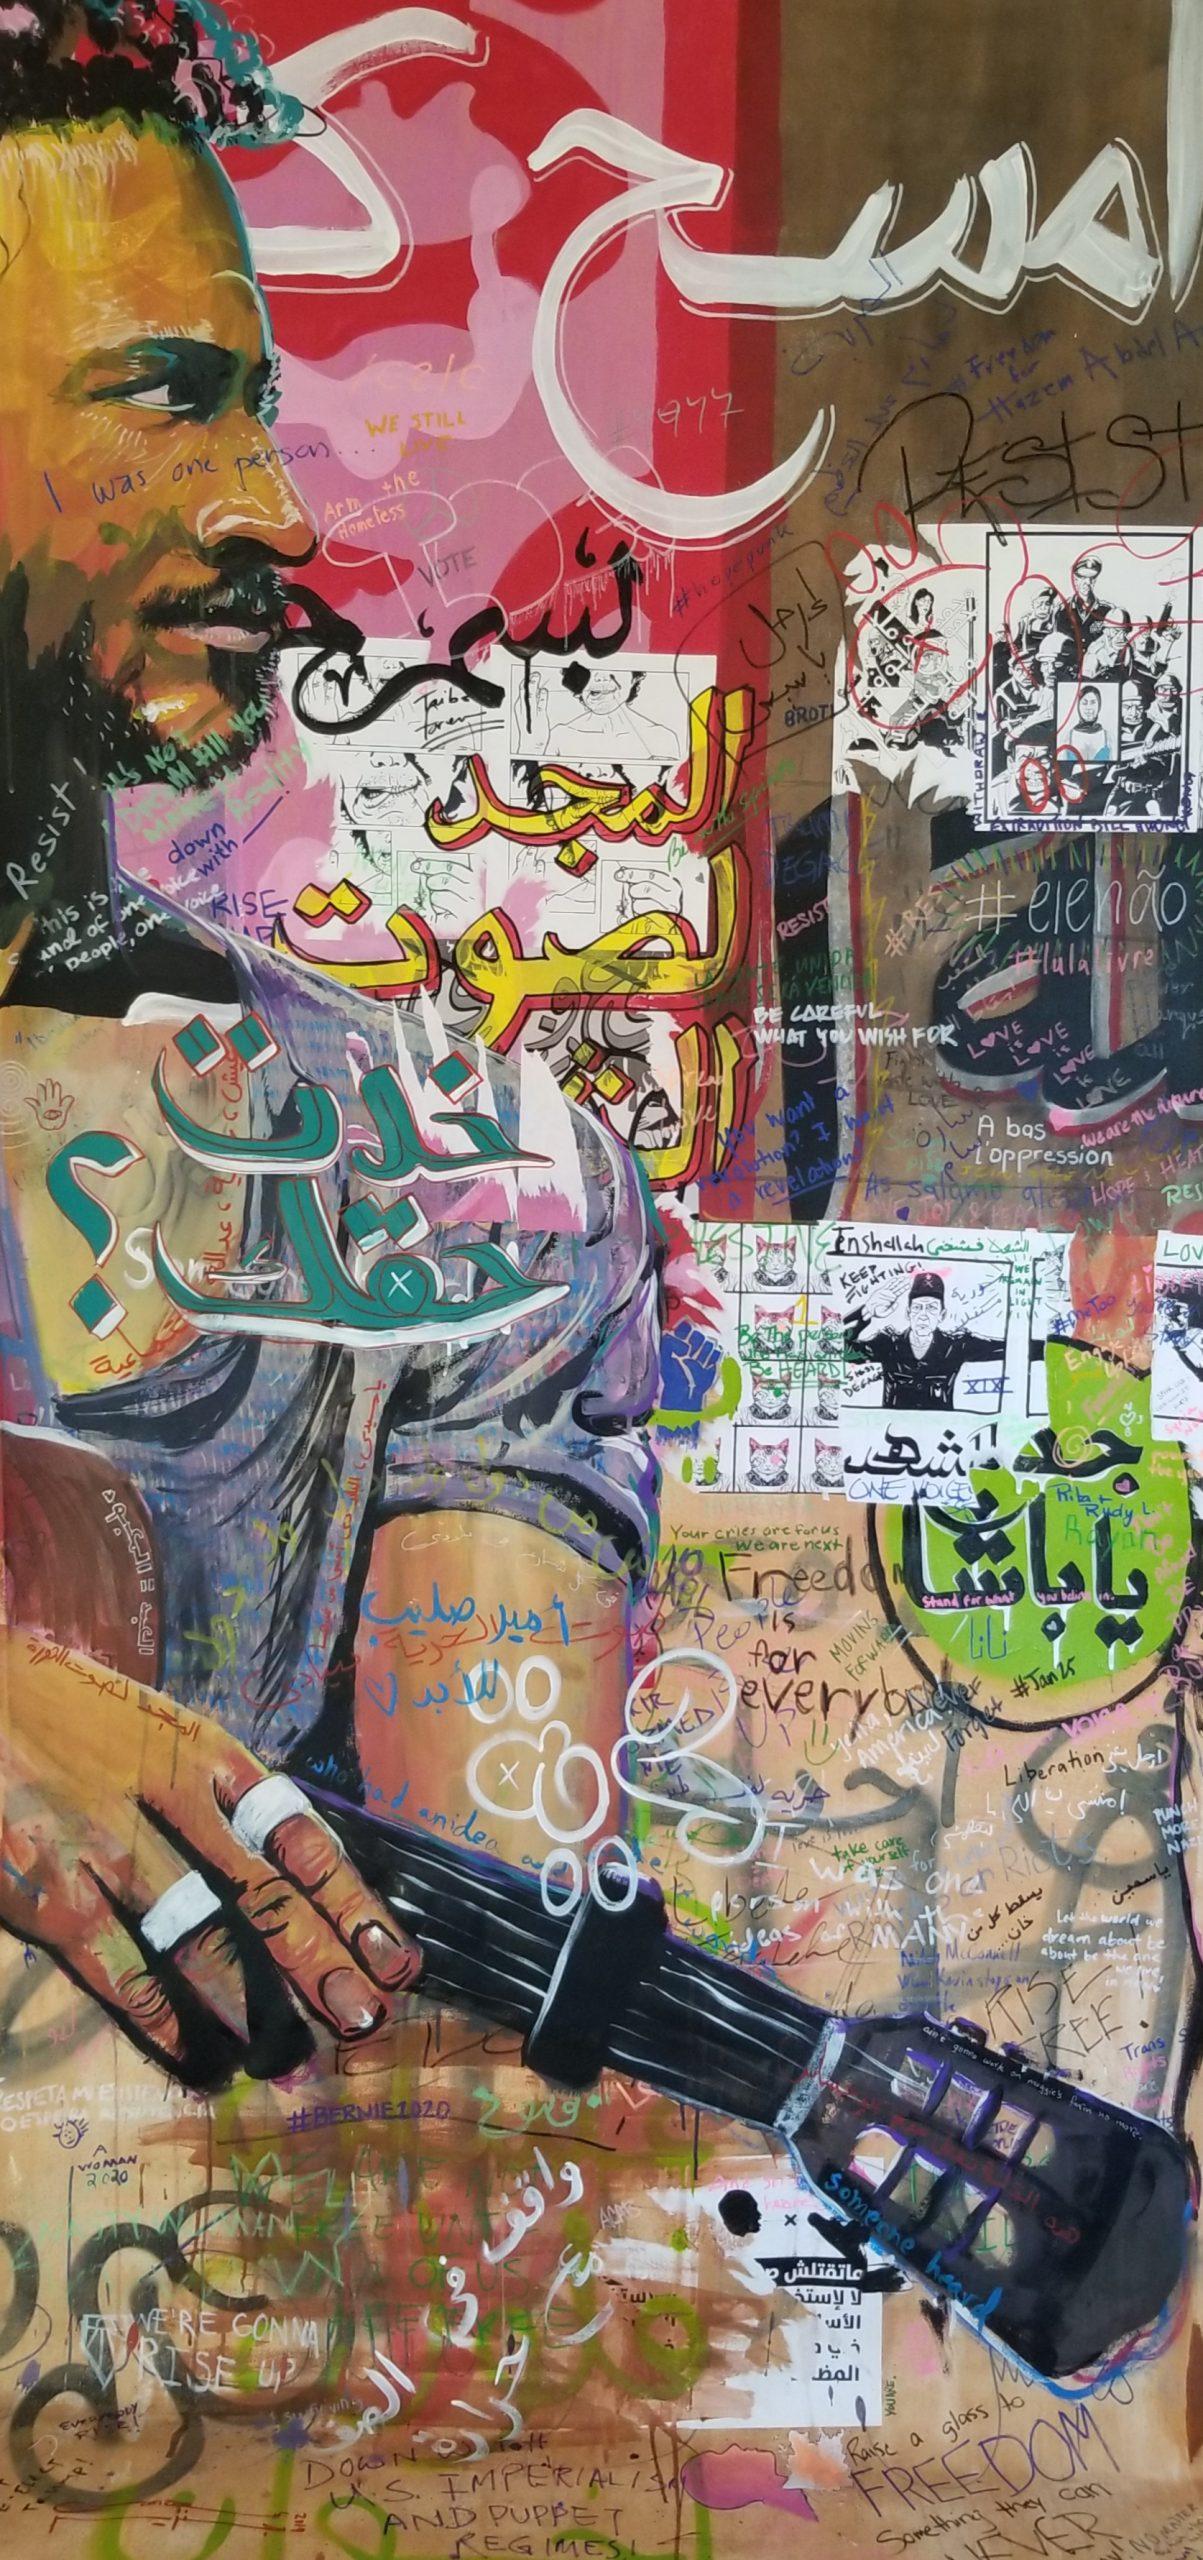 Ganzeer, Wall of Unfear #3, 2019. Mixed media on canvas, 48 x 106